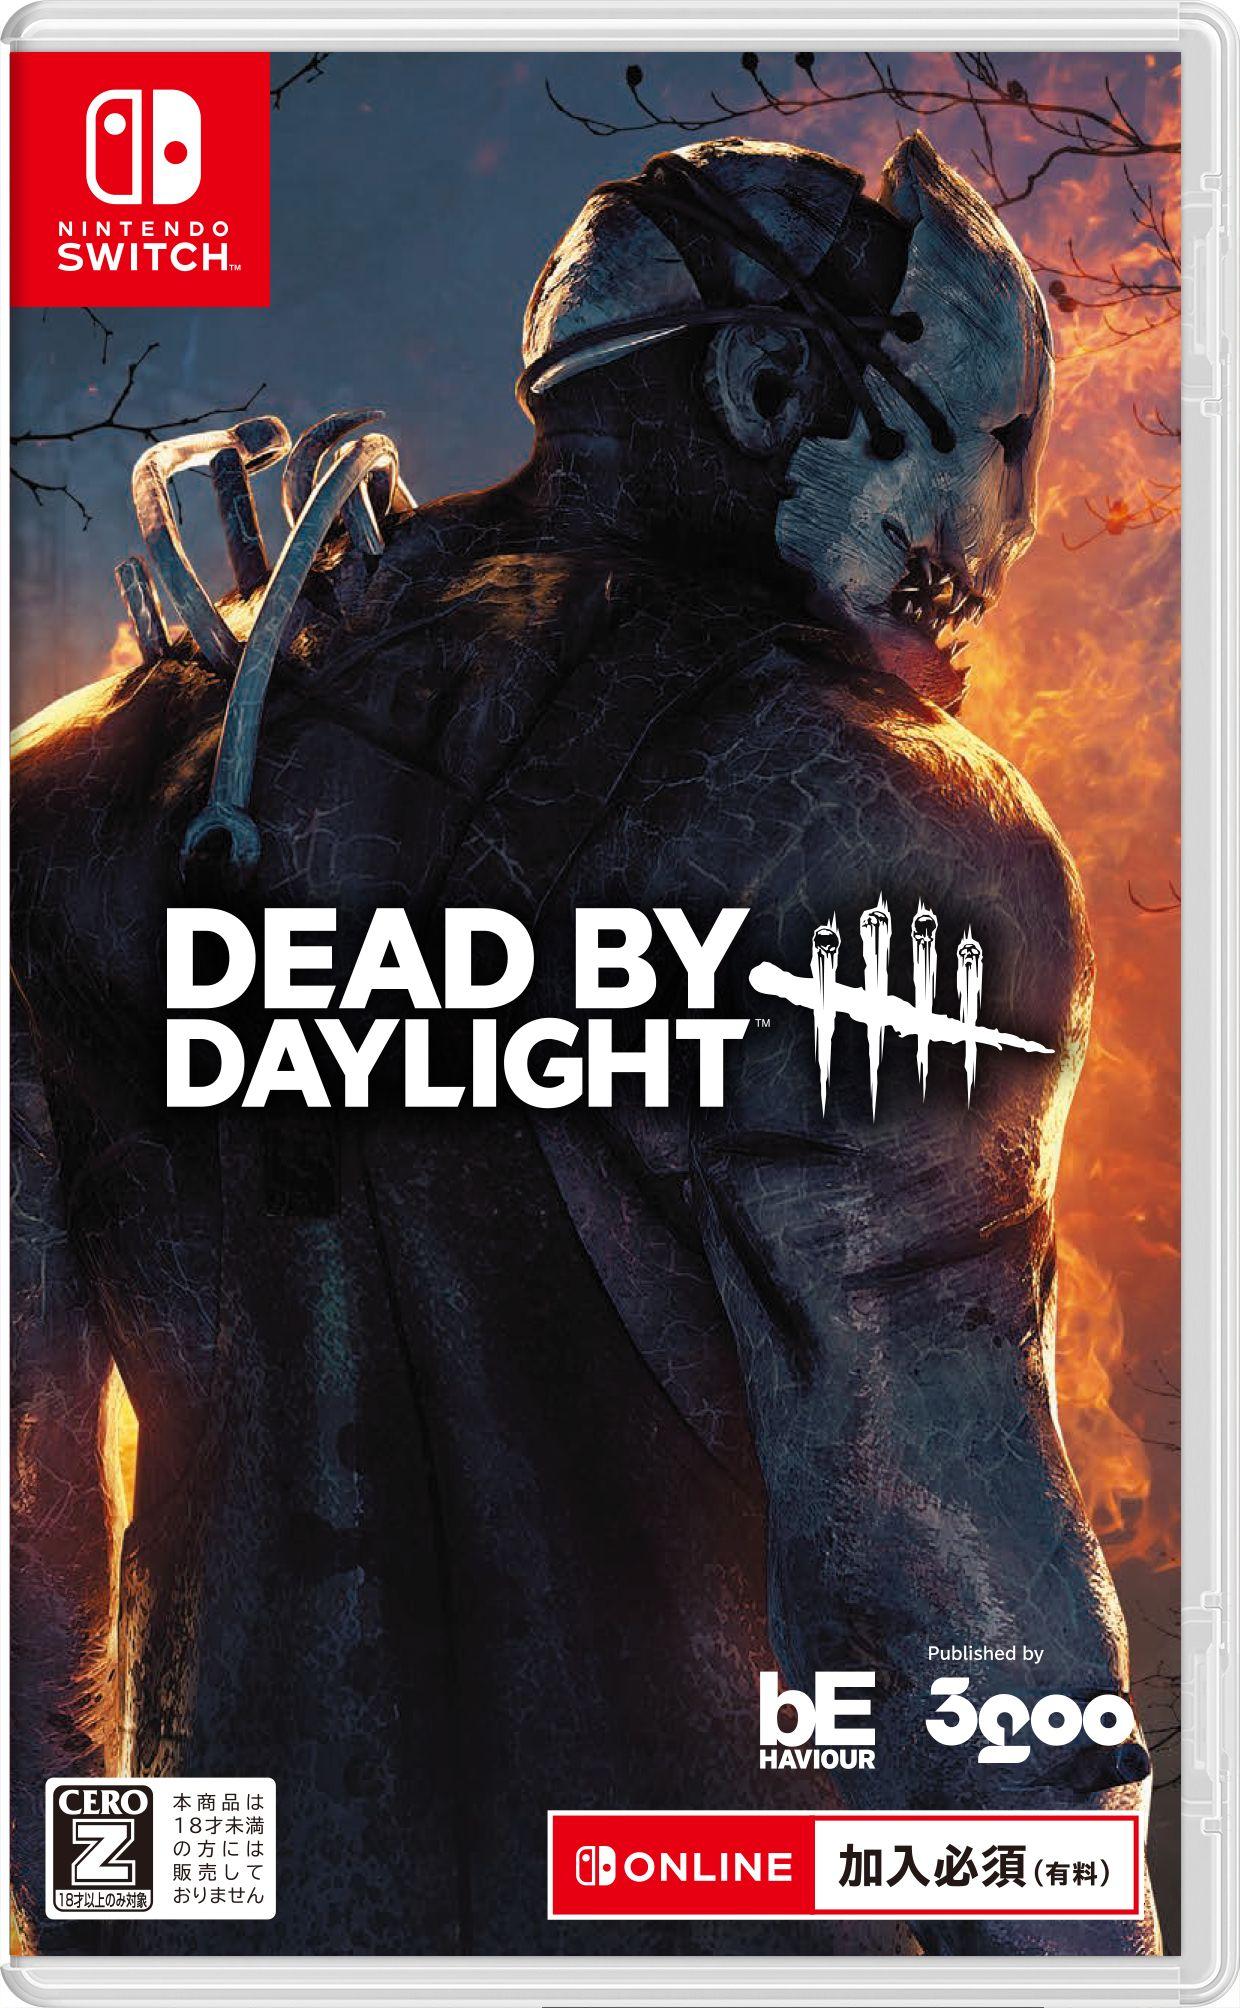 Nintendo Switch版「Dead by Daylight 公式日本版」